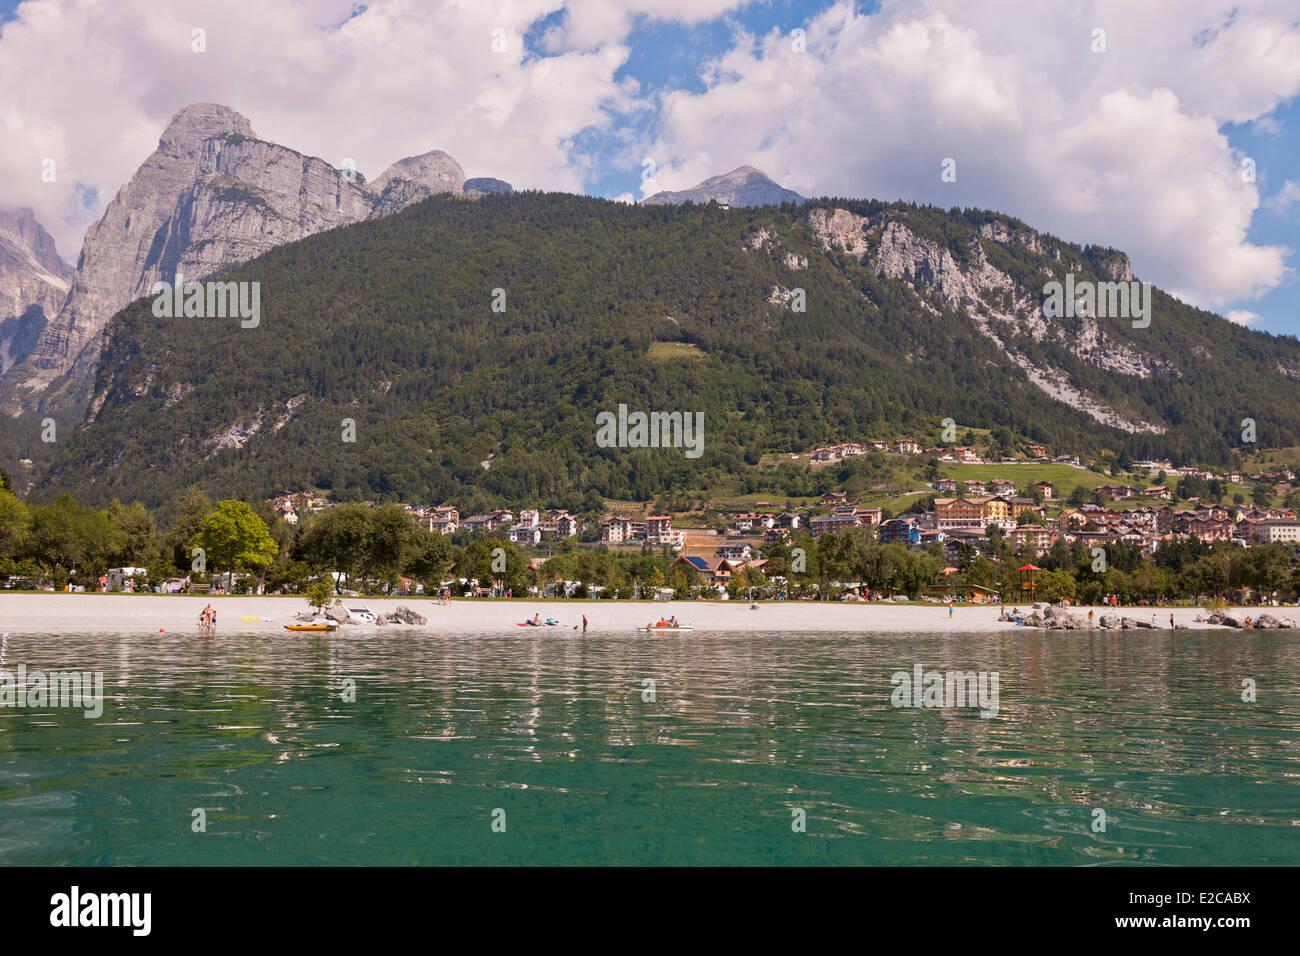 Italy, Trentino Alto Adige, Dolomites, Brenta group, Lake Molveno - Stock Image